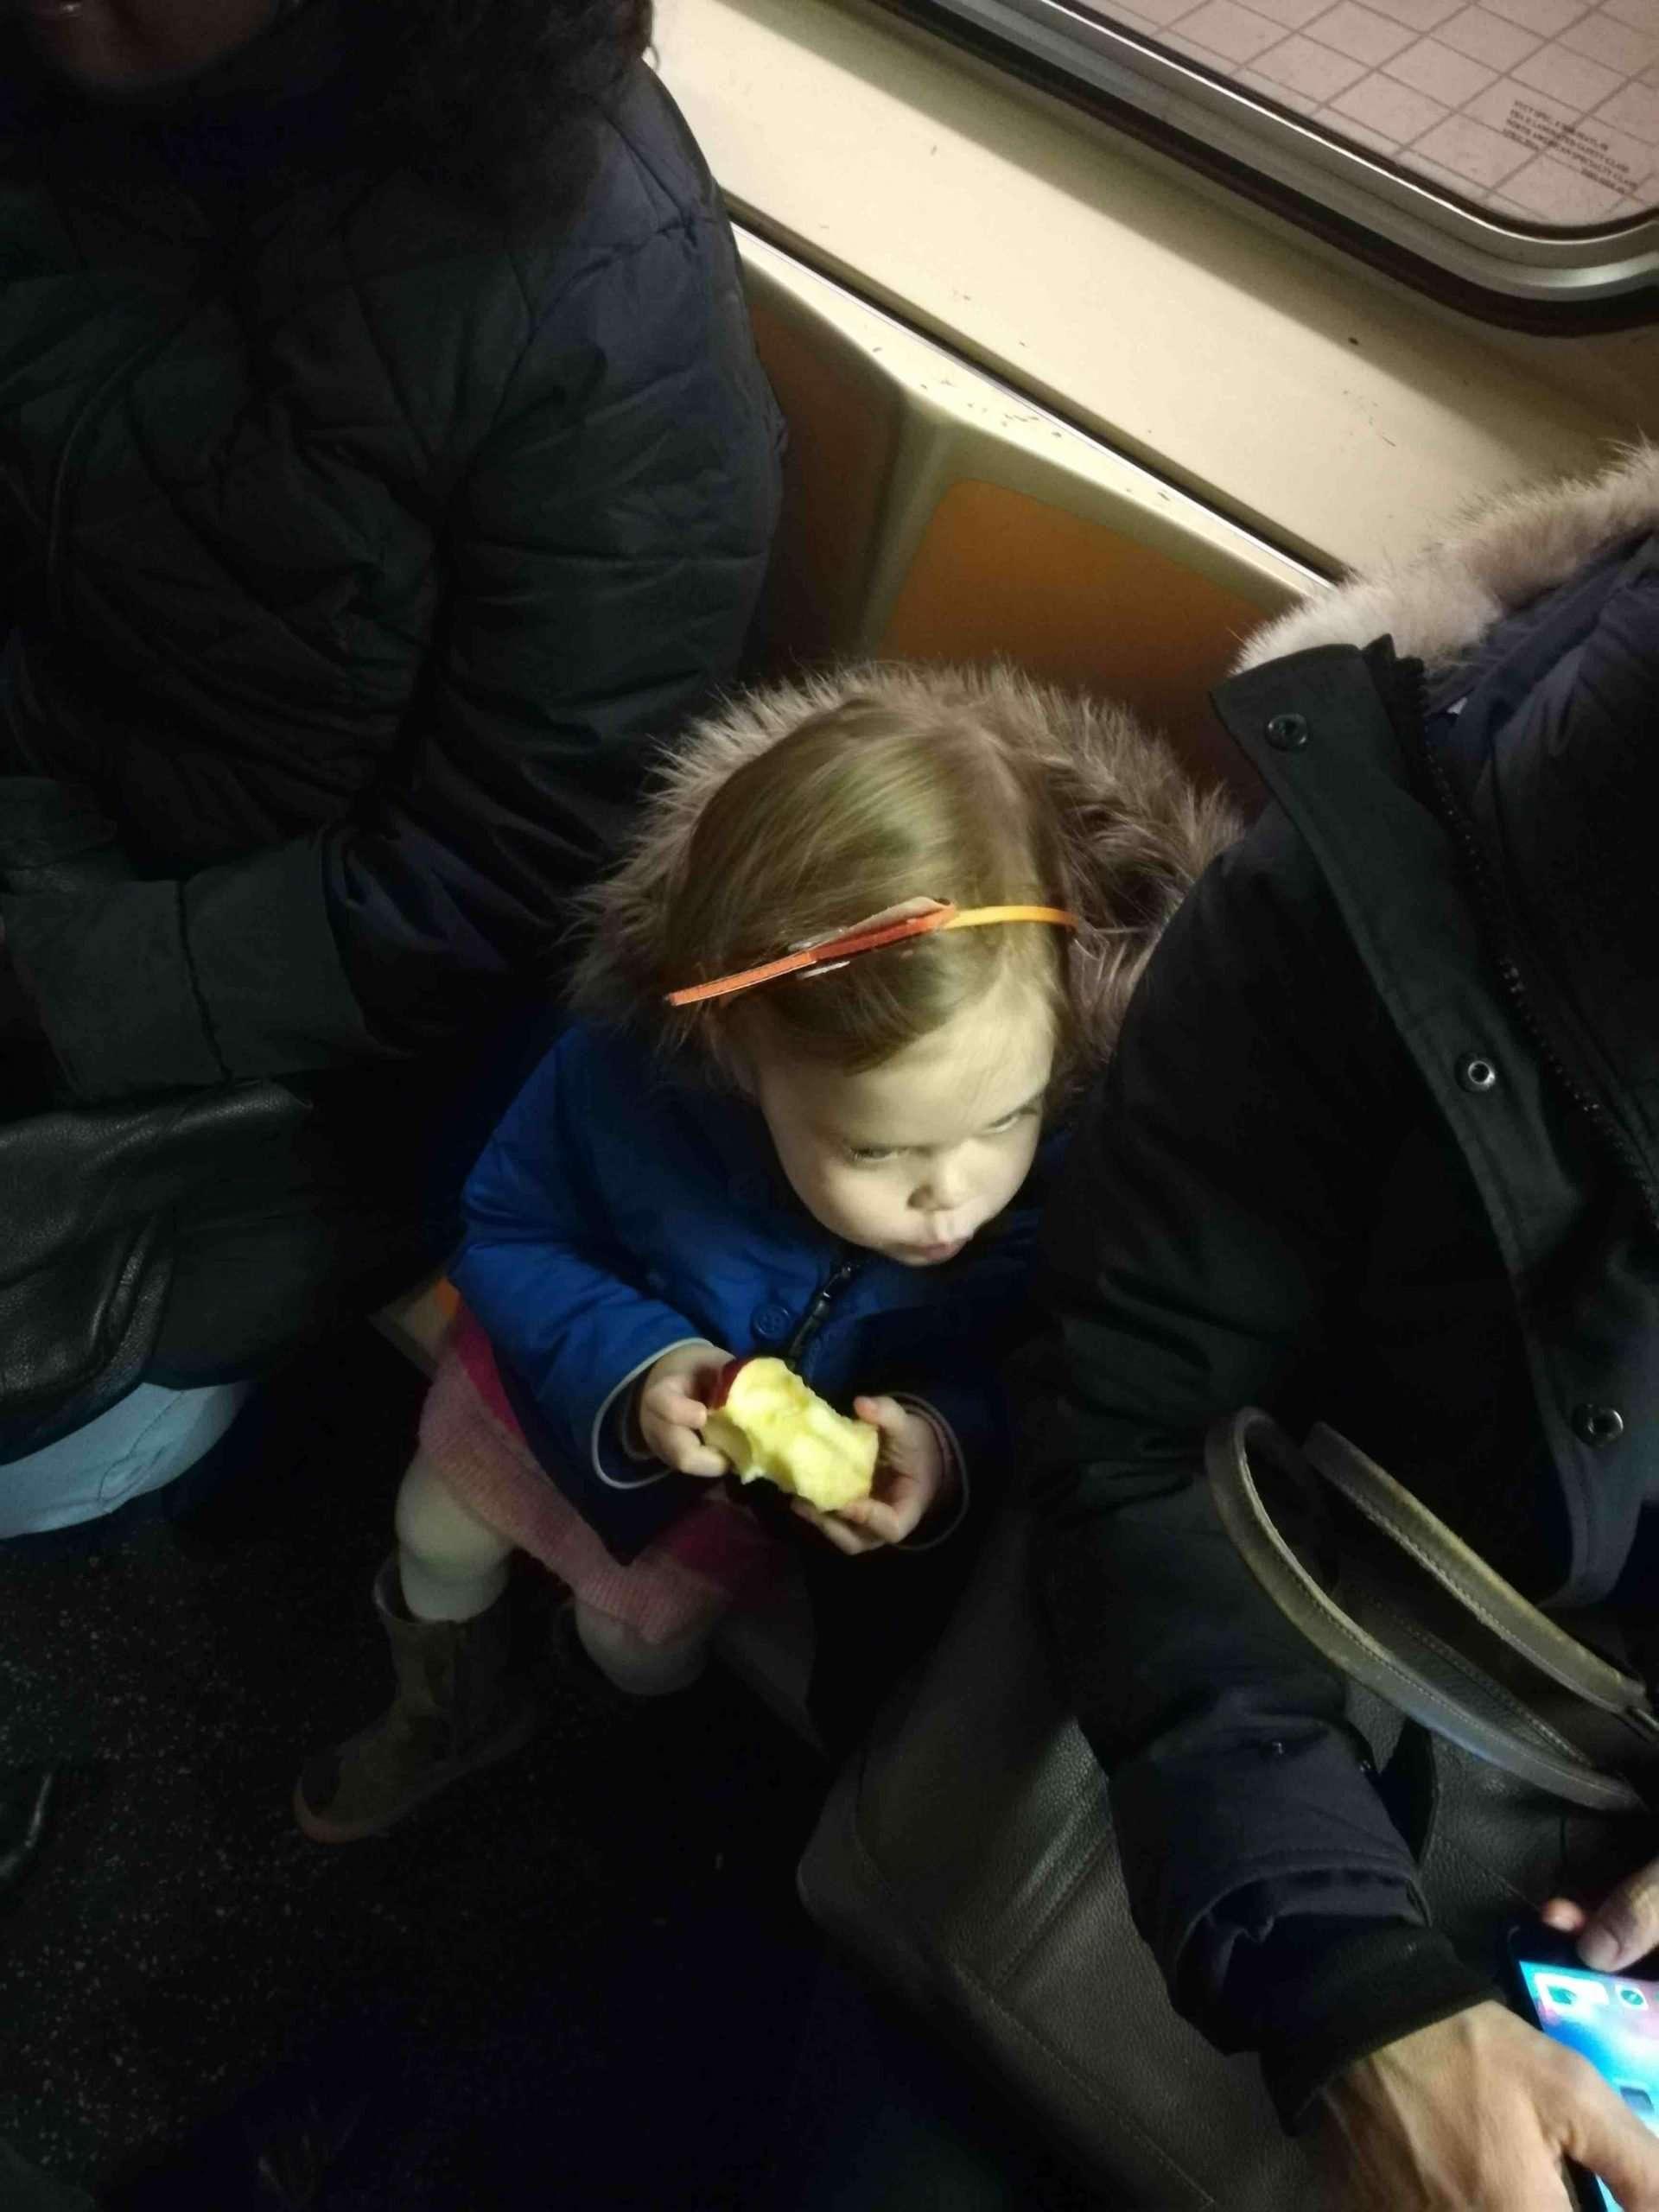 NYC MTA passenger girl